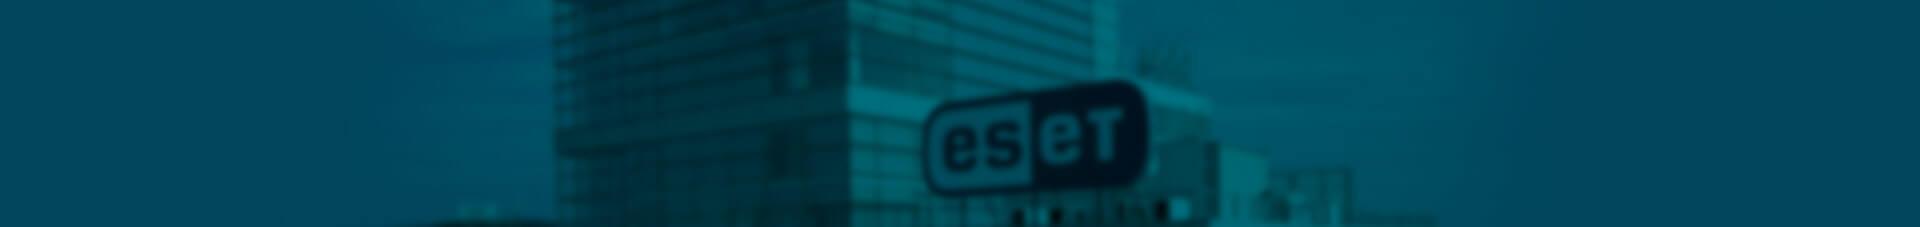 ESET Indrustry analyst banner